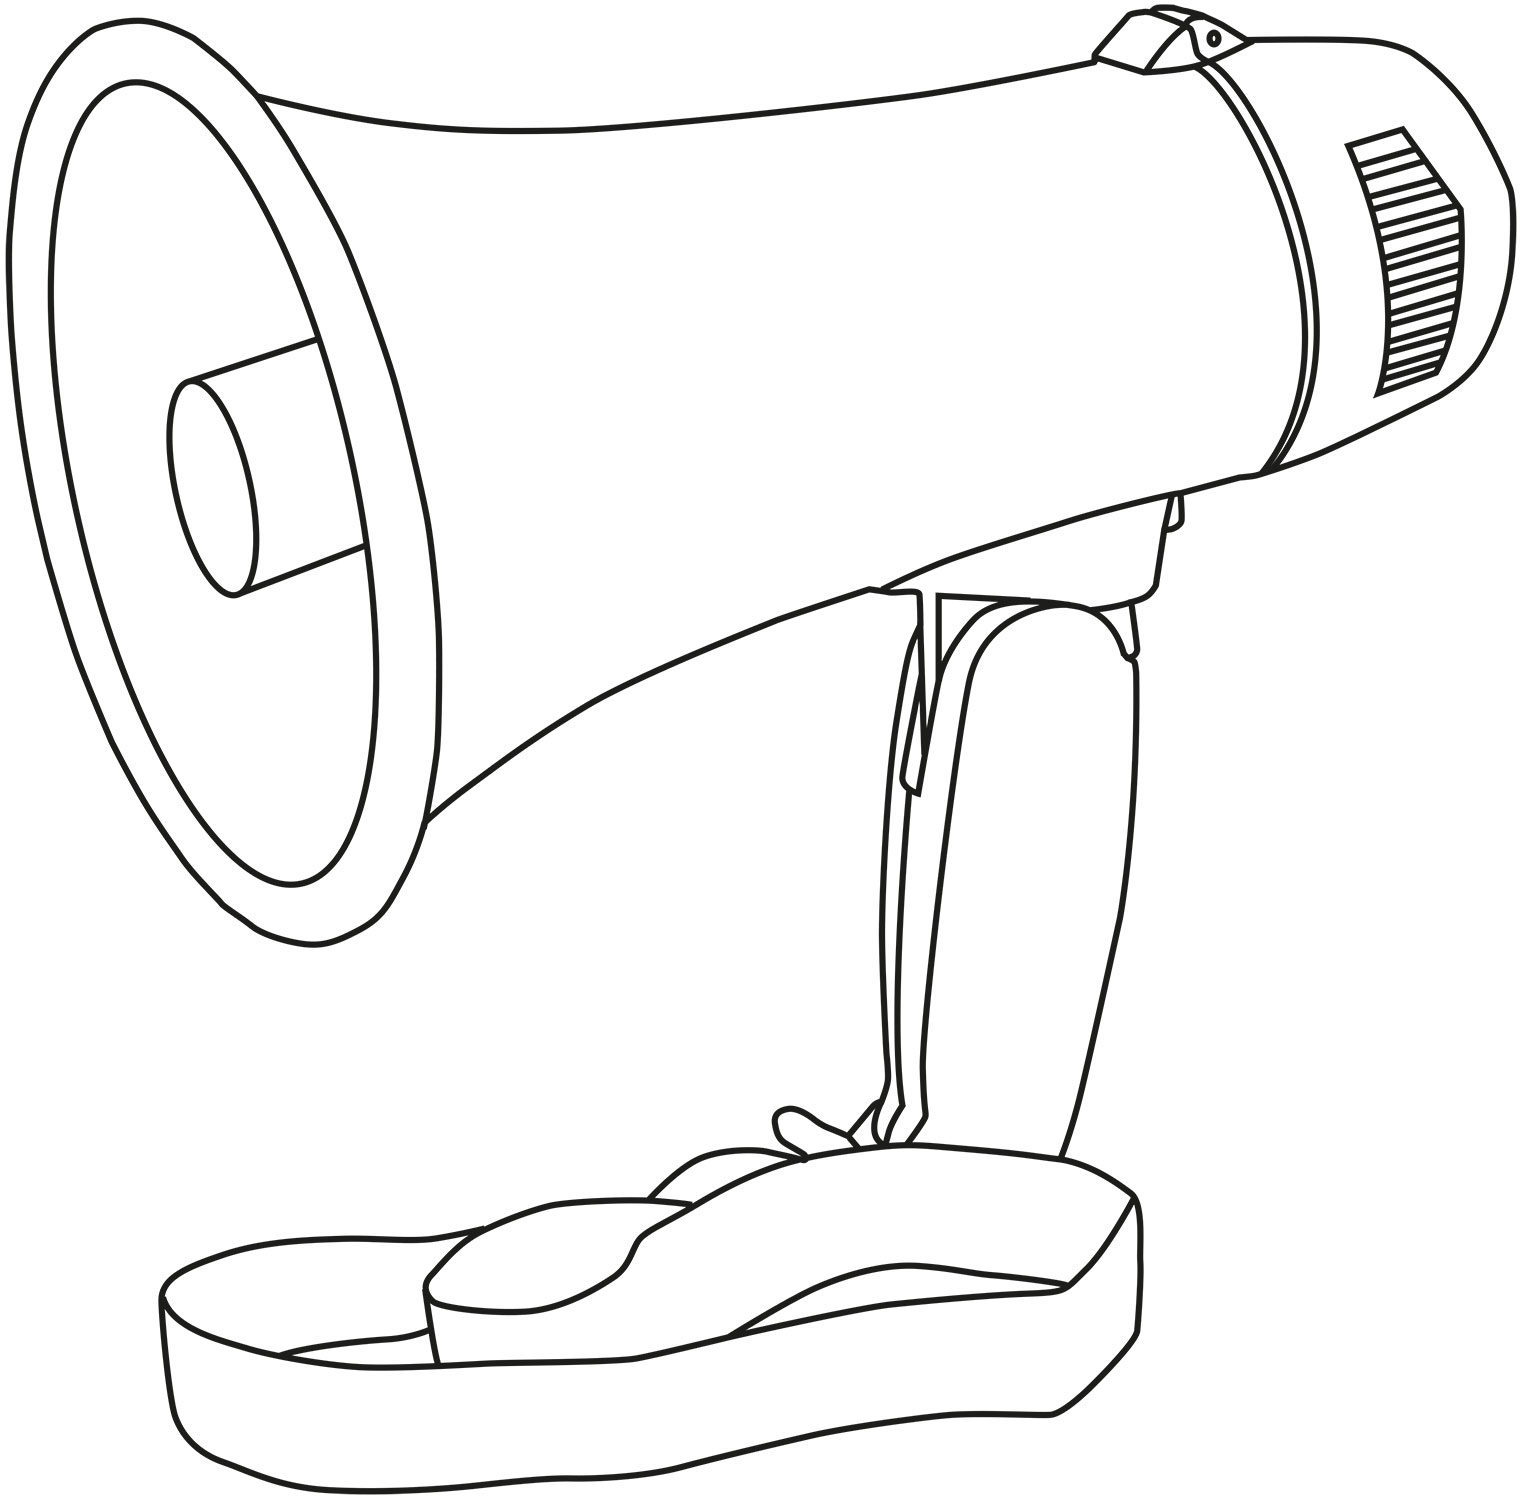 megaphone 10w pistol grip loud speaker siren hailer very